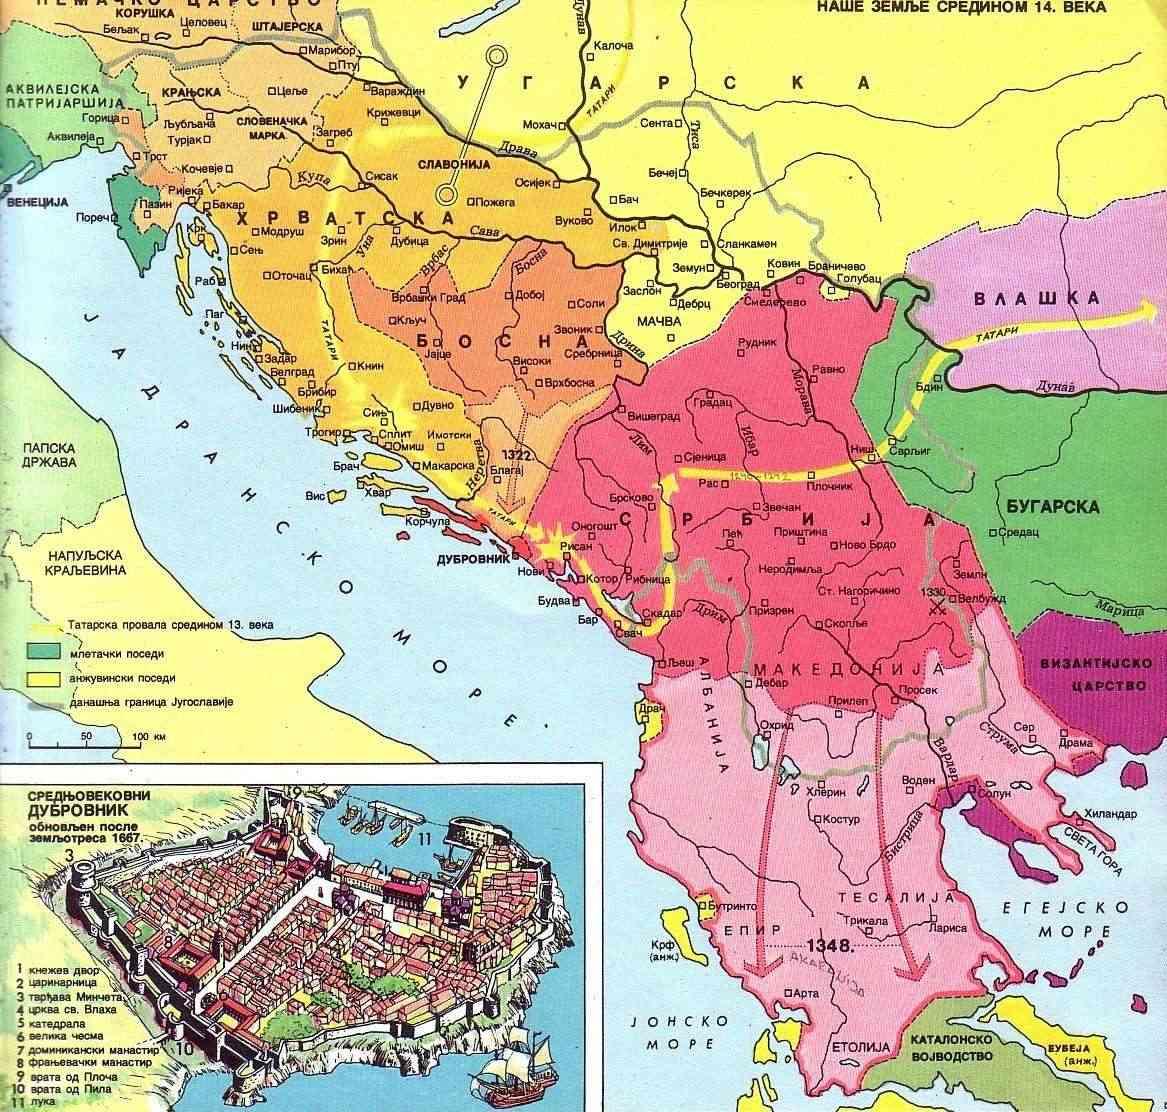 Zemlje stare YUgoslavije sredinom XIV veka Zemlje10